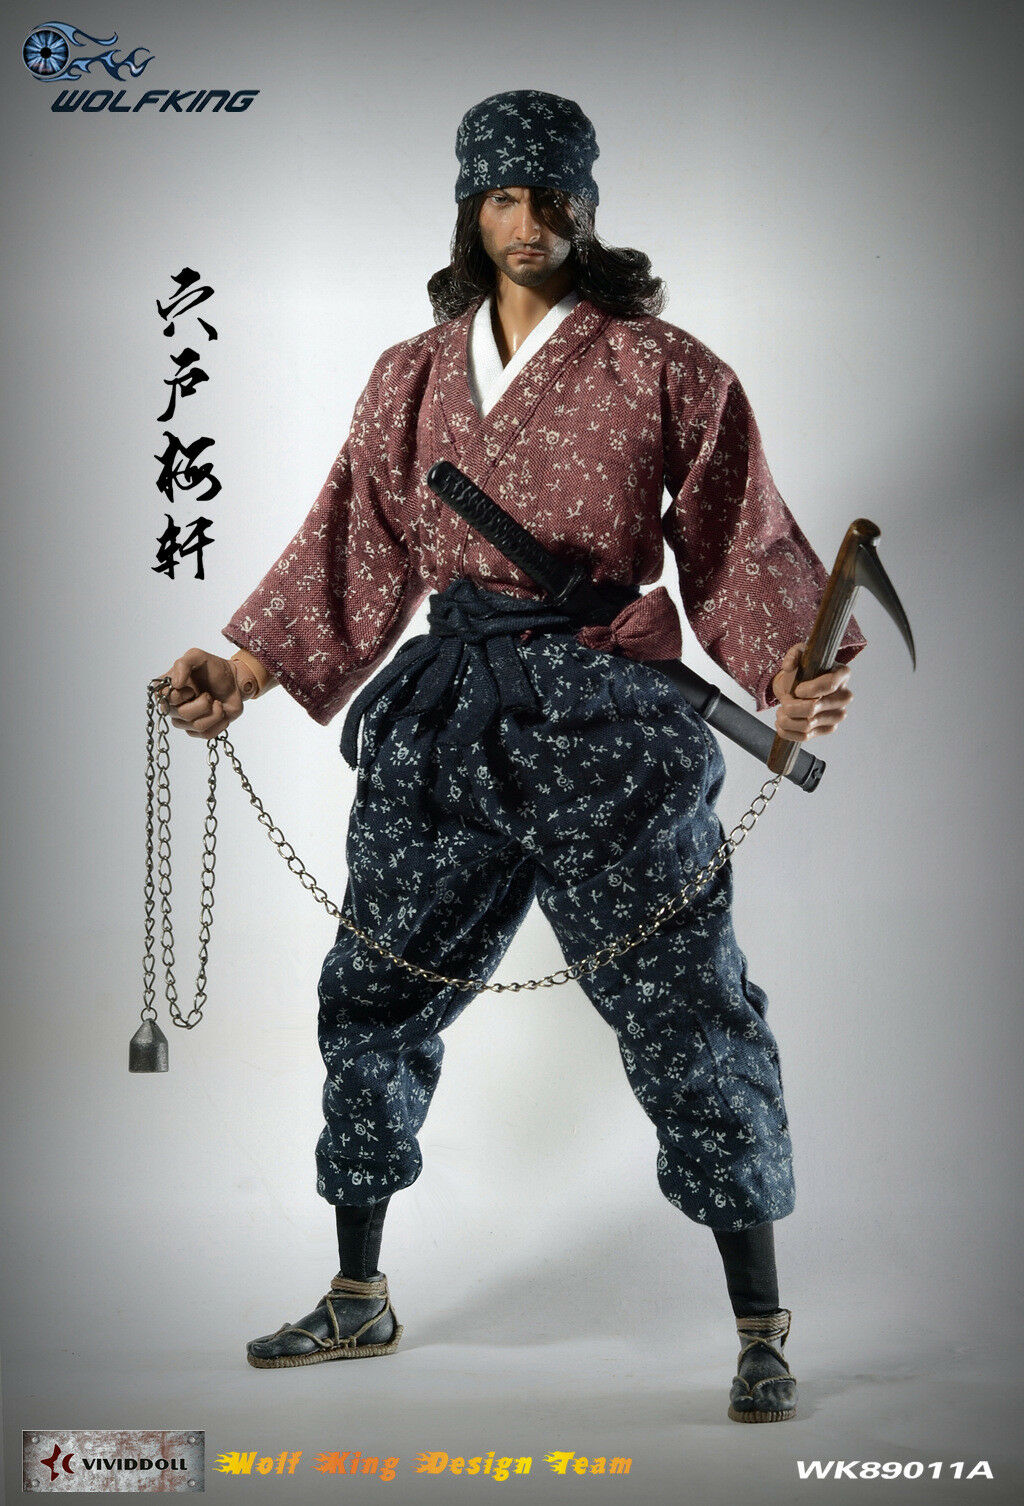 Wolf King 1/6 穴户梅轩Shishido Baiken Japanese Swordsman Boxed Figure 89011